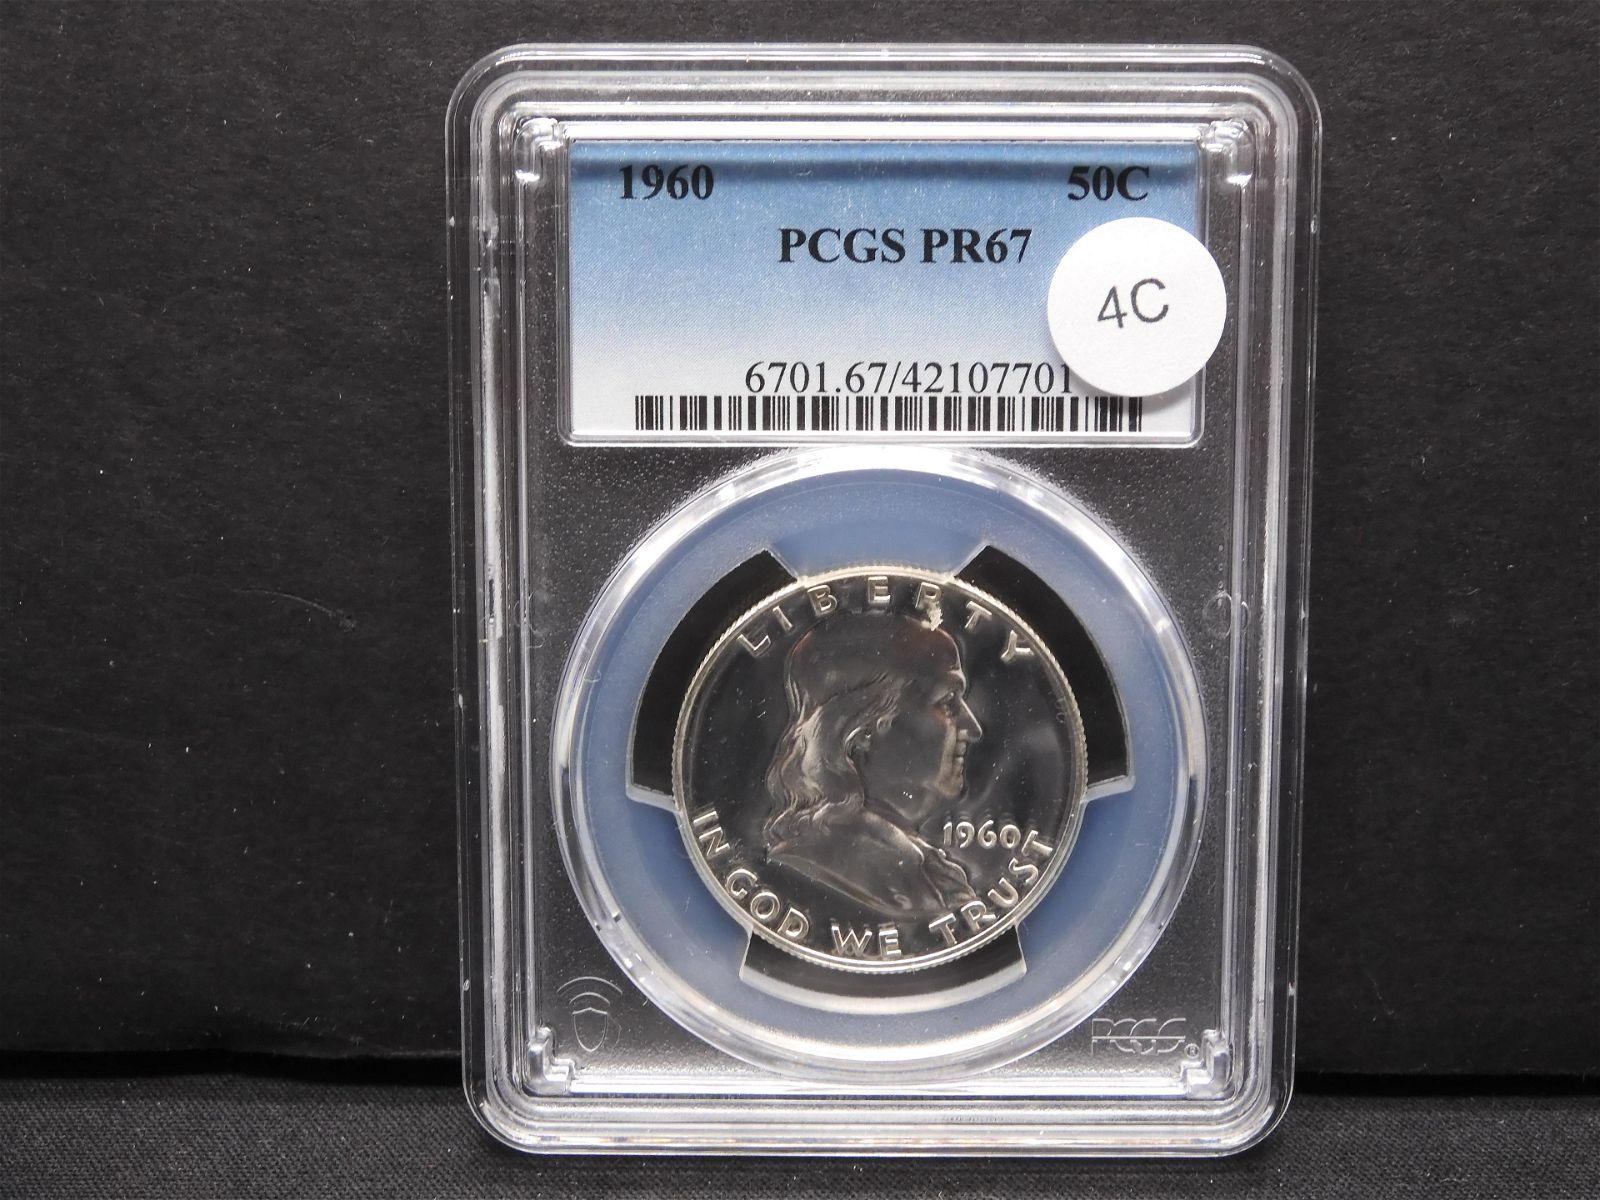 1960 Franklin 50c. PCGS PR67.